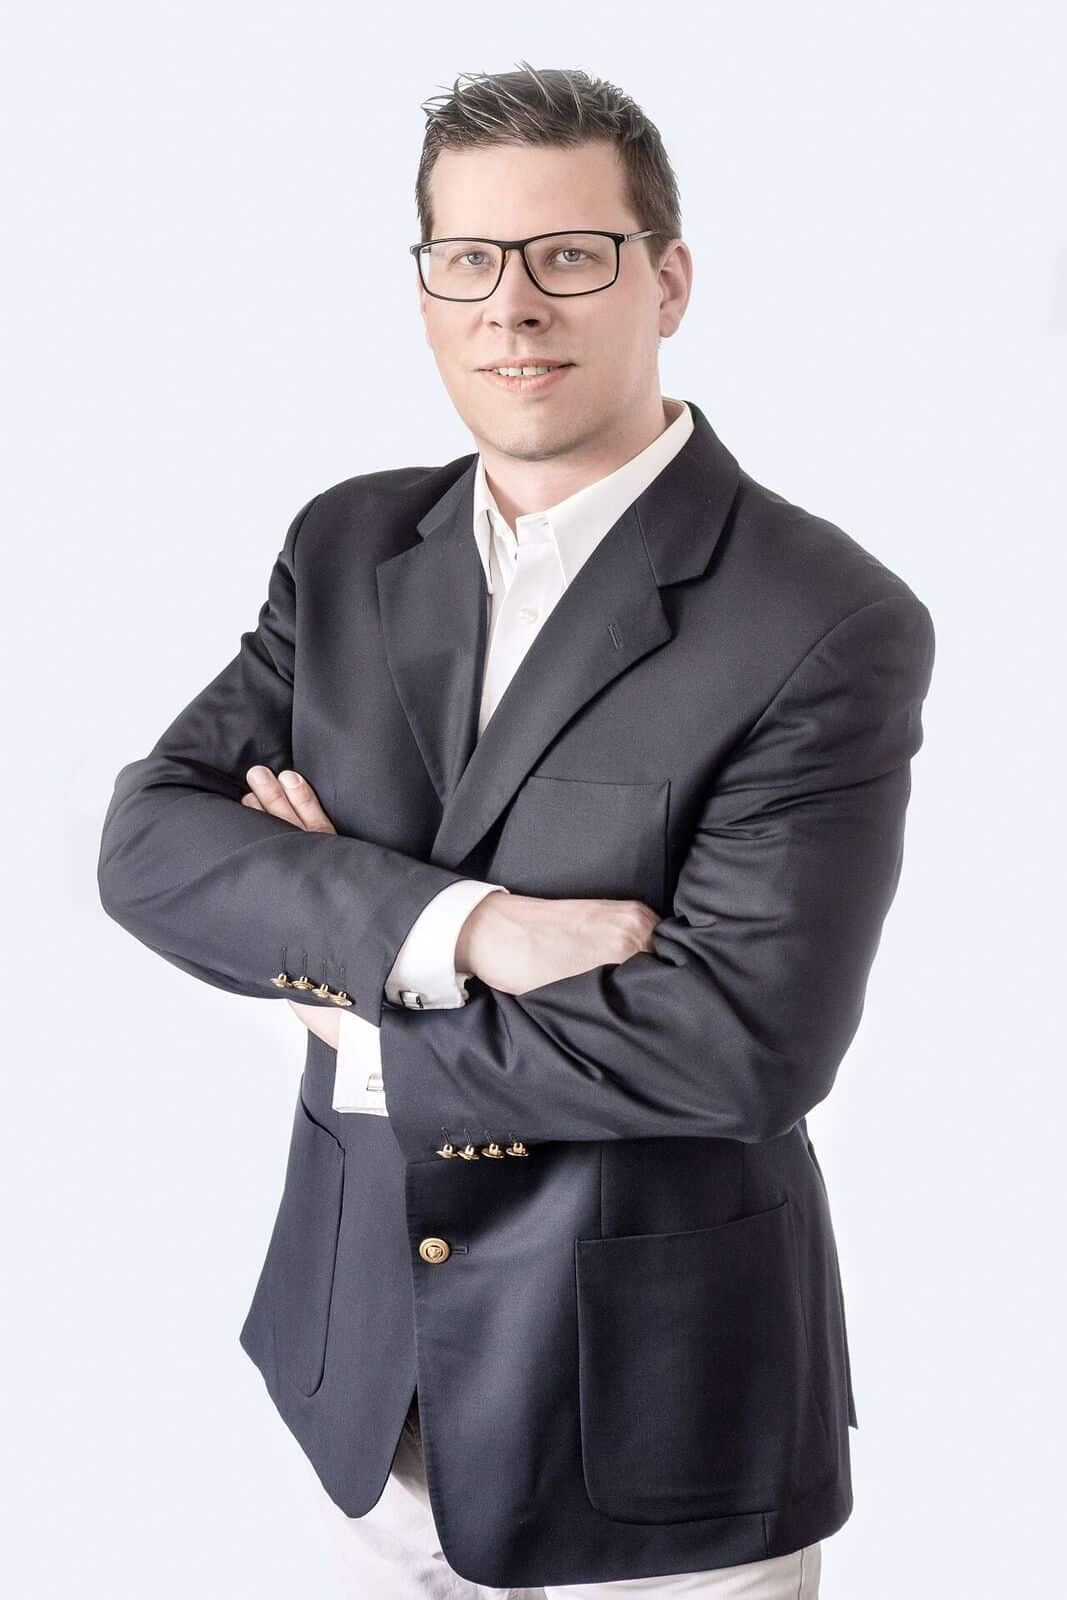 Selbstständiger Immobilienberater ALBERT JAKOB IMMOBILIEN